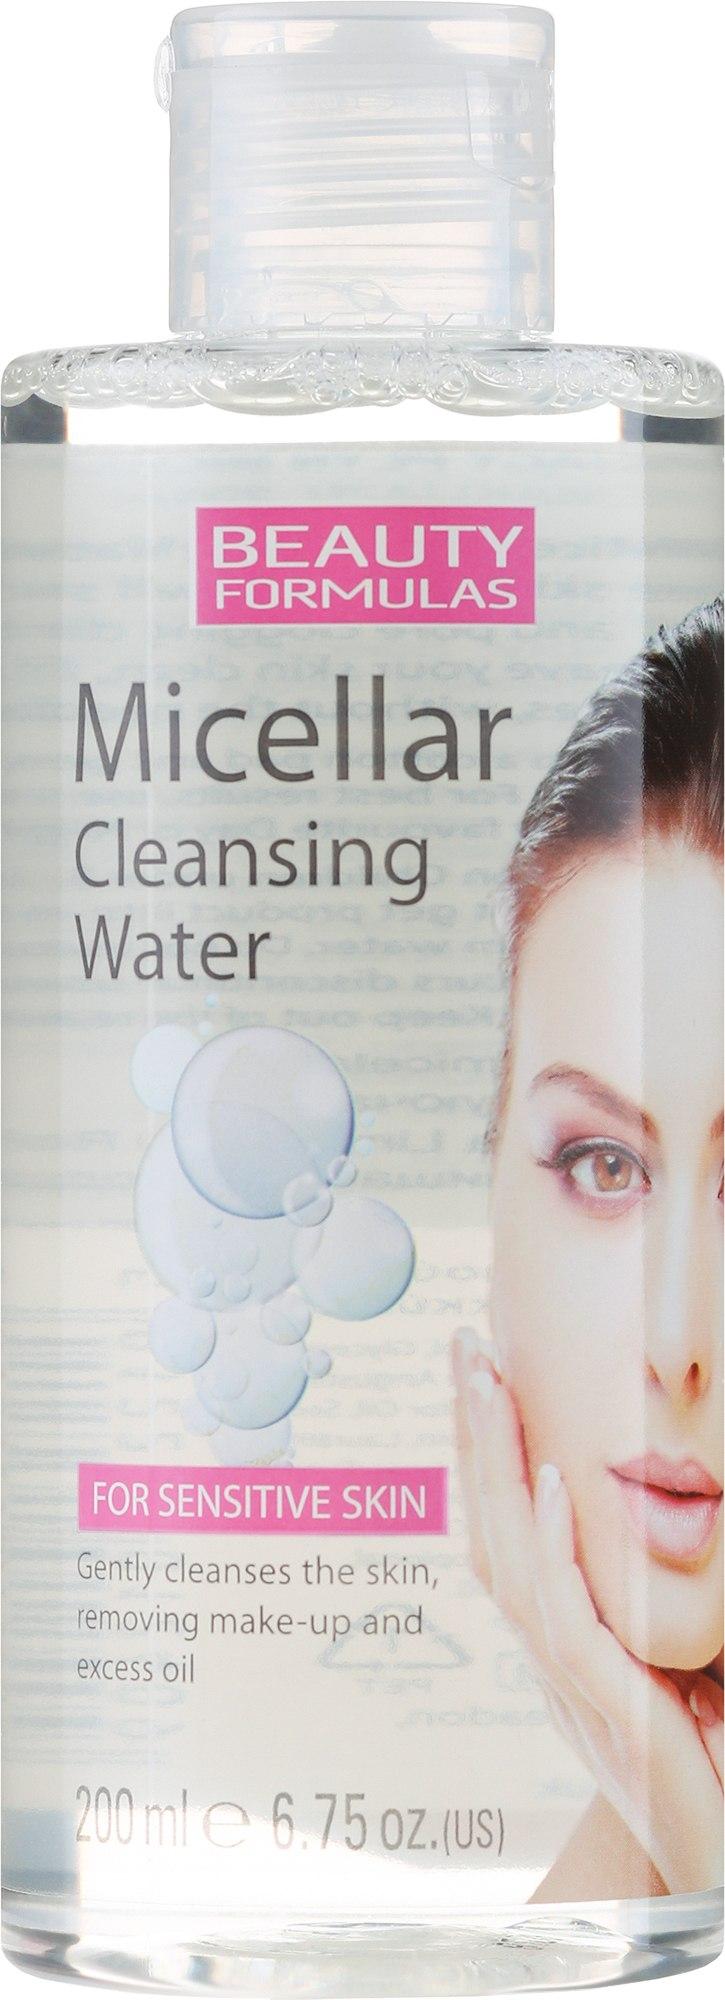 Мицеларна вода за лице - Beauty Formulas Micellar Cleansing Water — снимка 200 ml